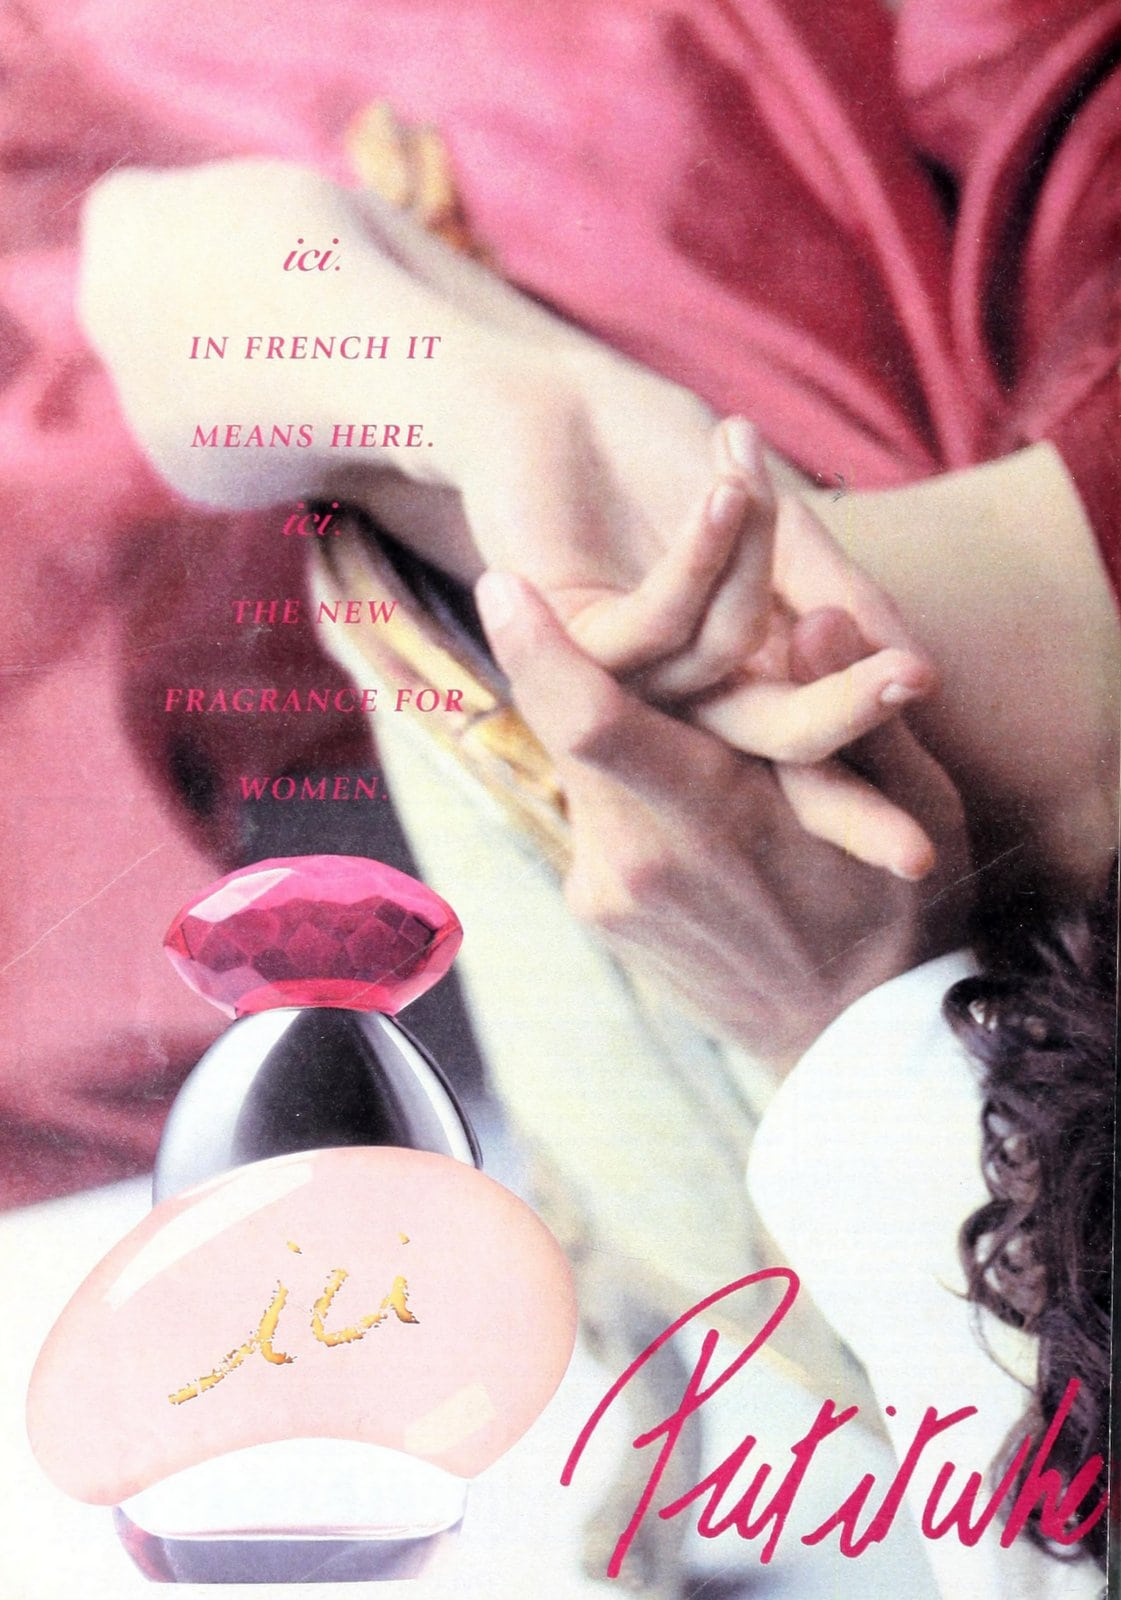 Ici fragrance for women (1995) at ClickAmericana.com